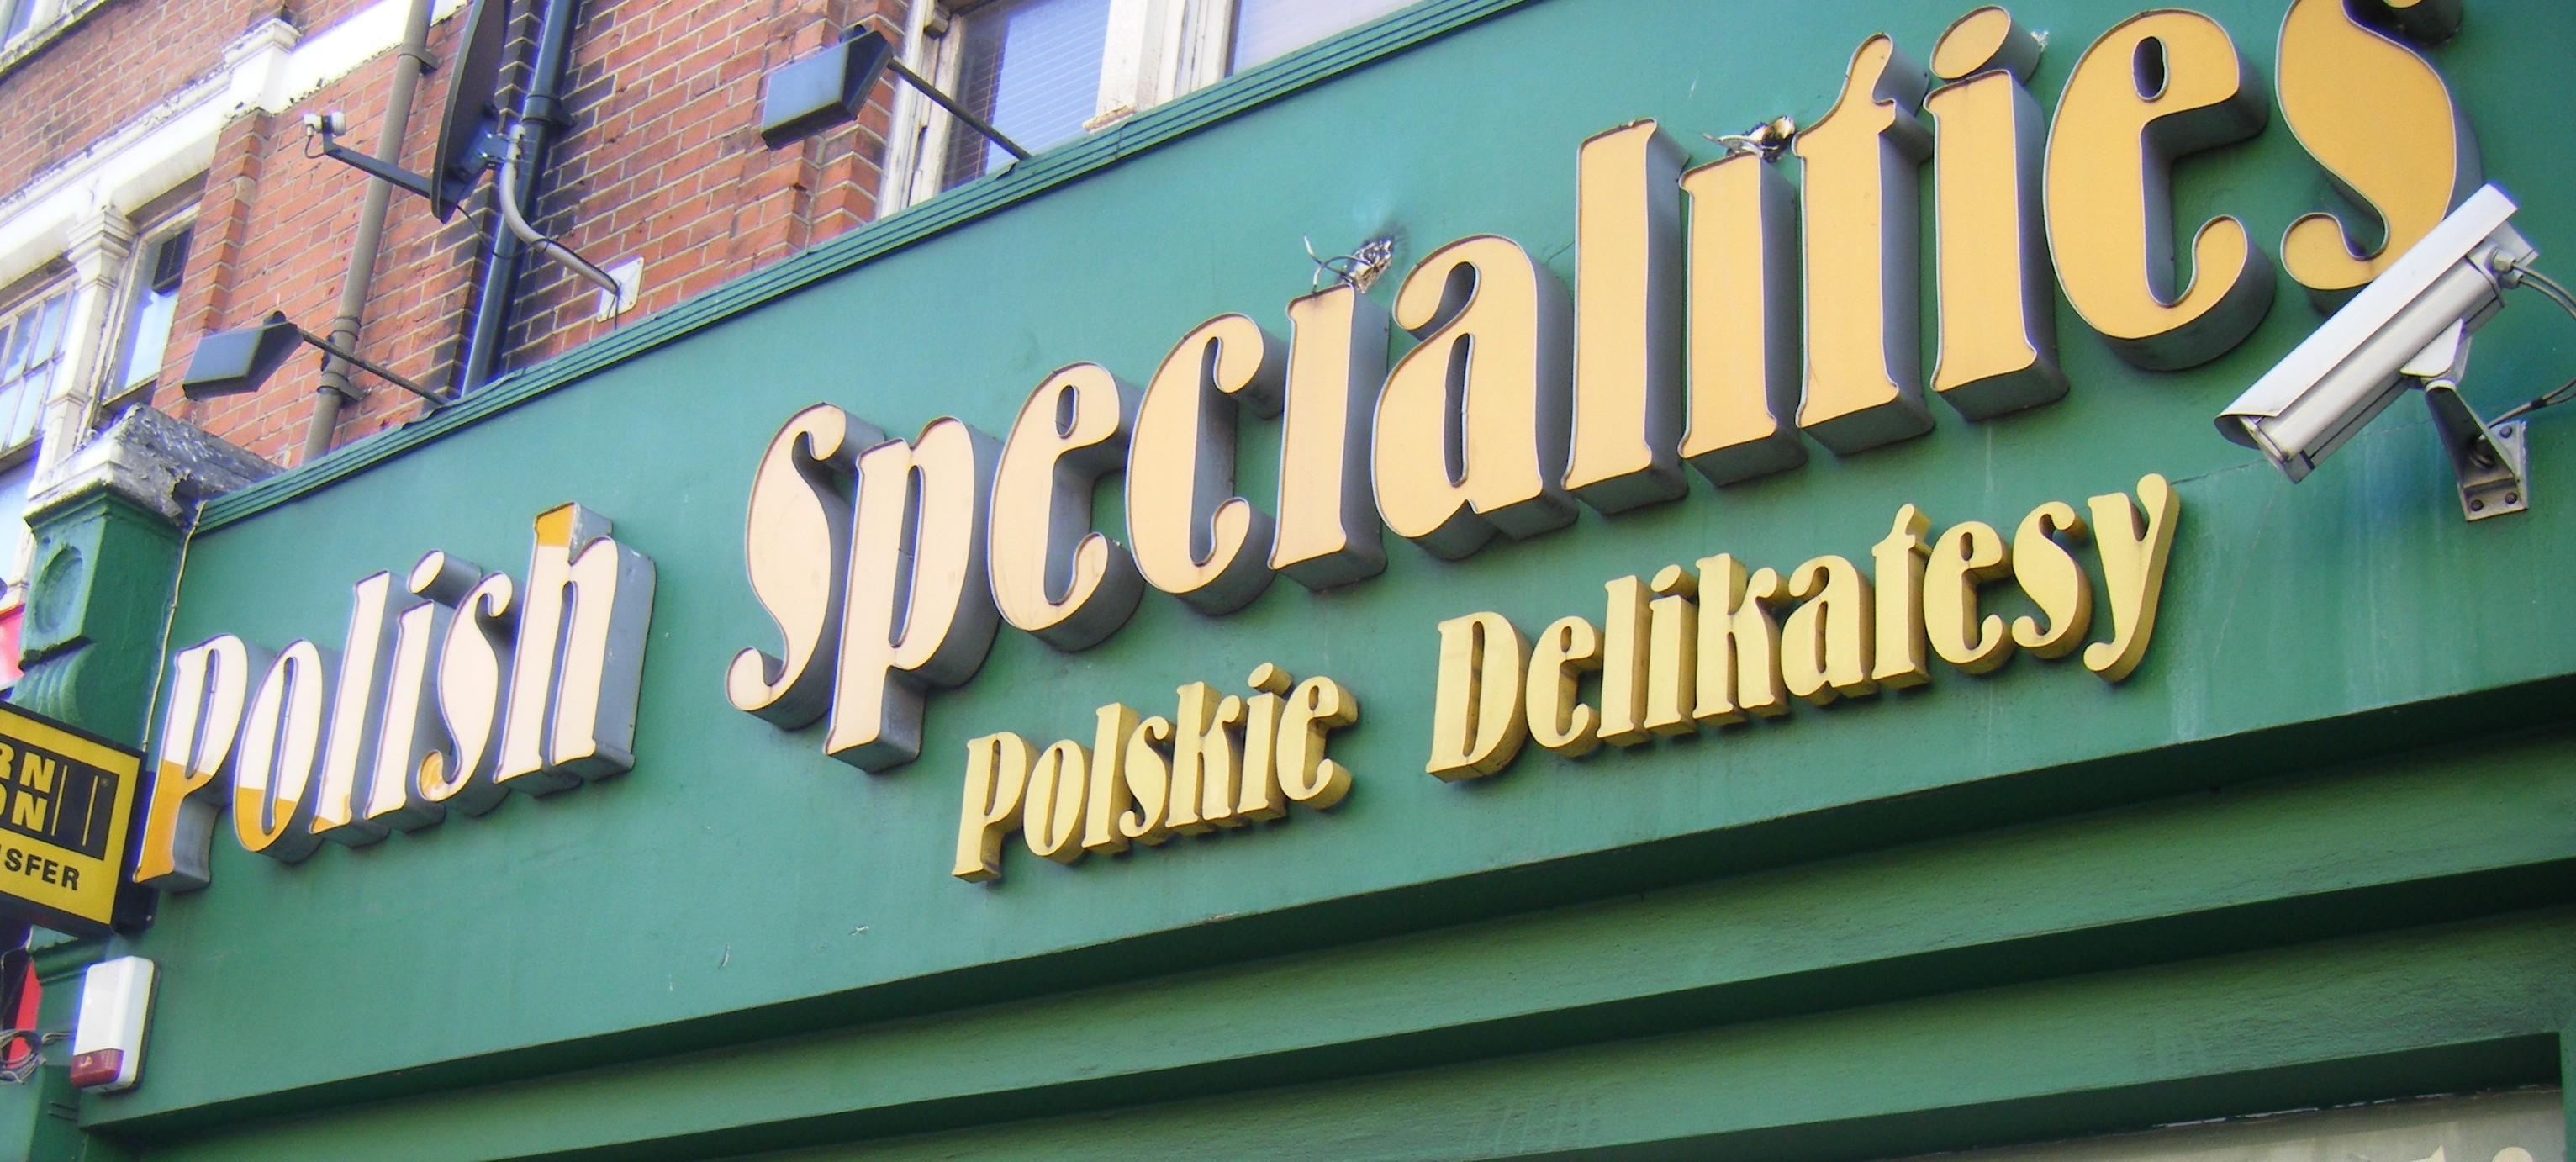 Polish Specialties 1